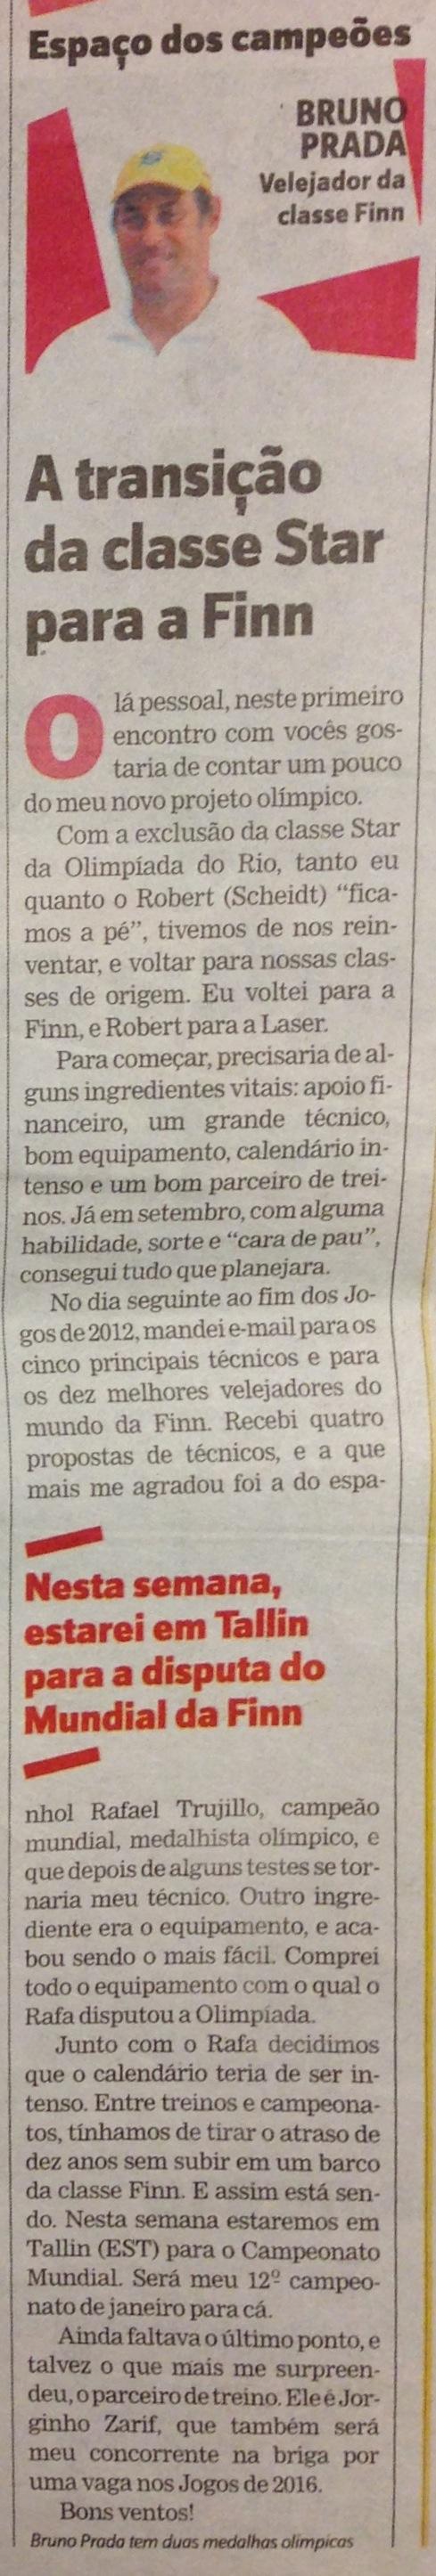 Coluna de Bruno Prada de 21/08/2013 no Jornal Esportivo Lance http://nolance.net/19wX1mR #finnsailing #olympicsailing #brunoprada #finngoldcup